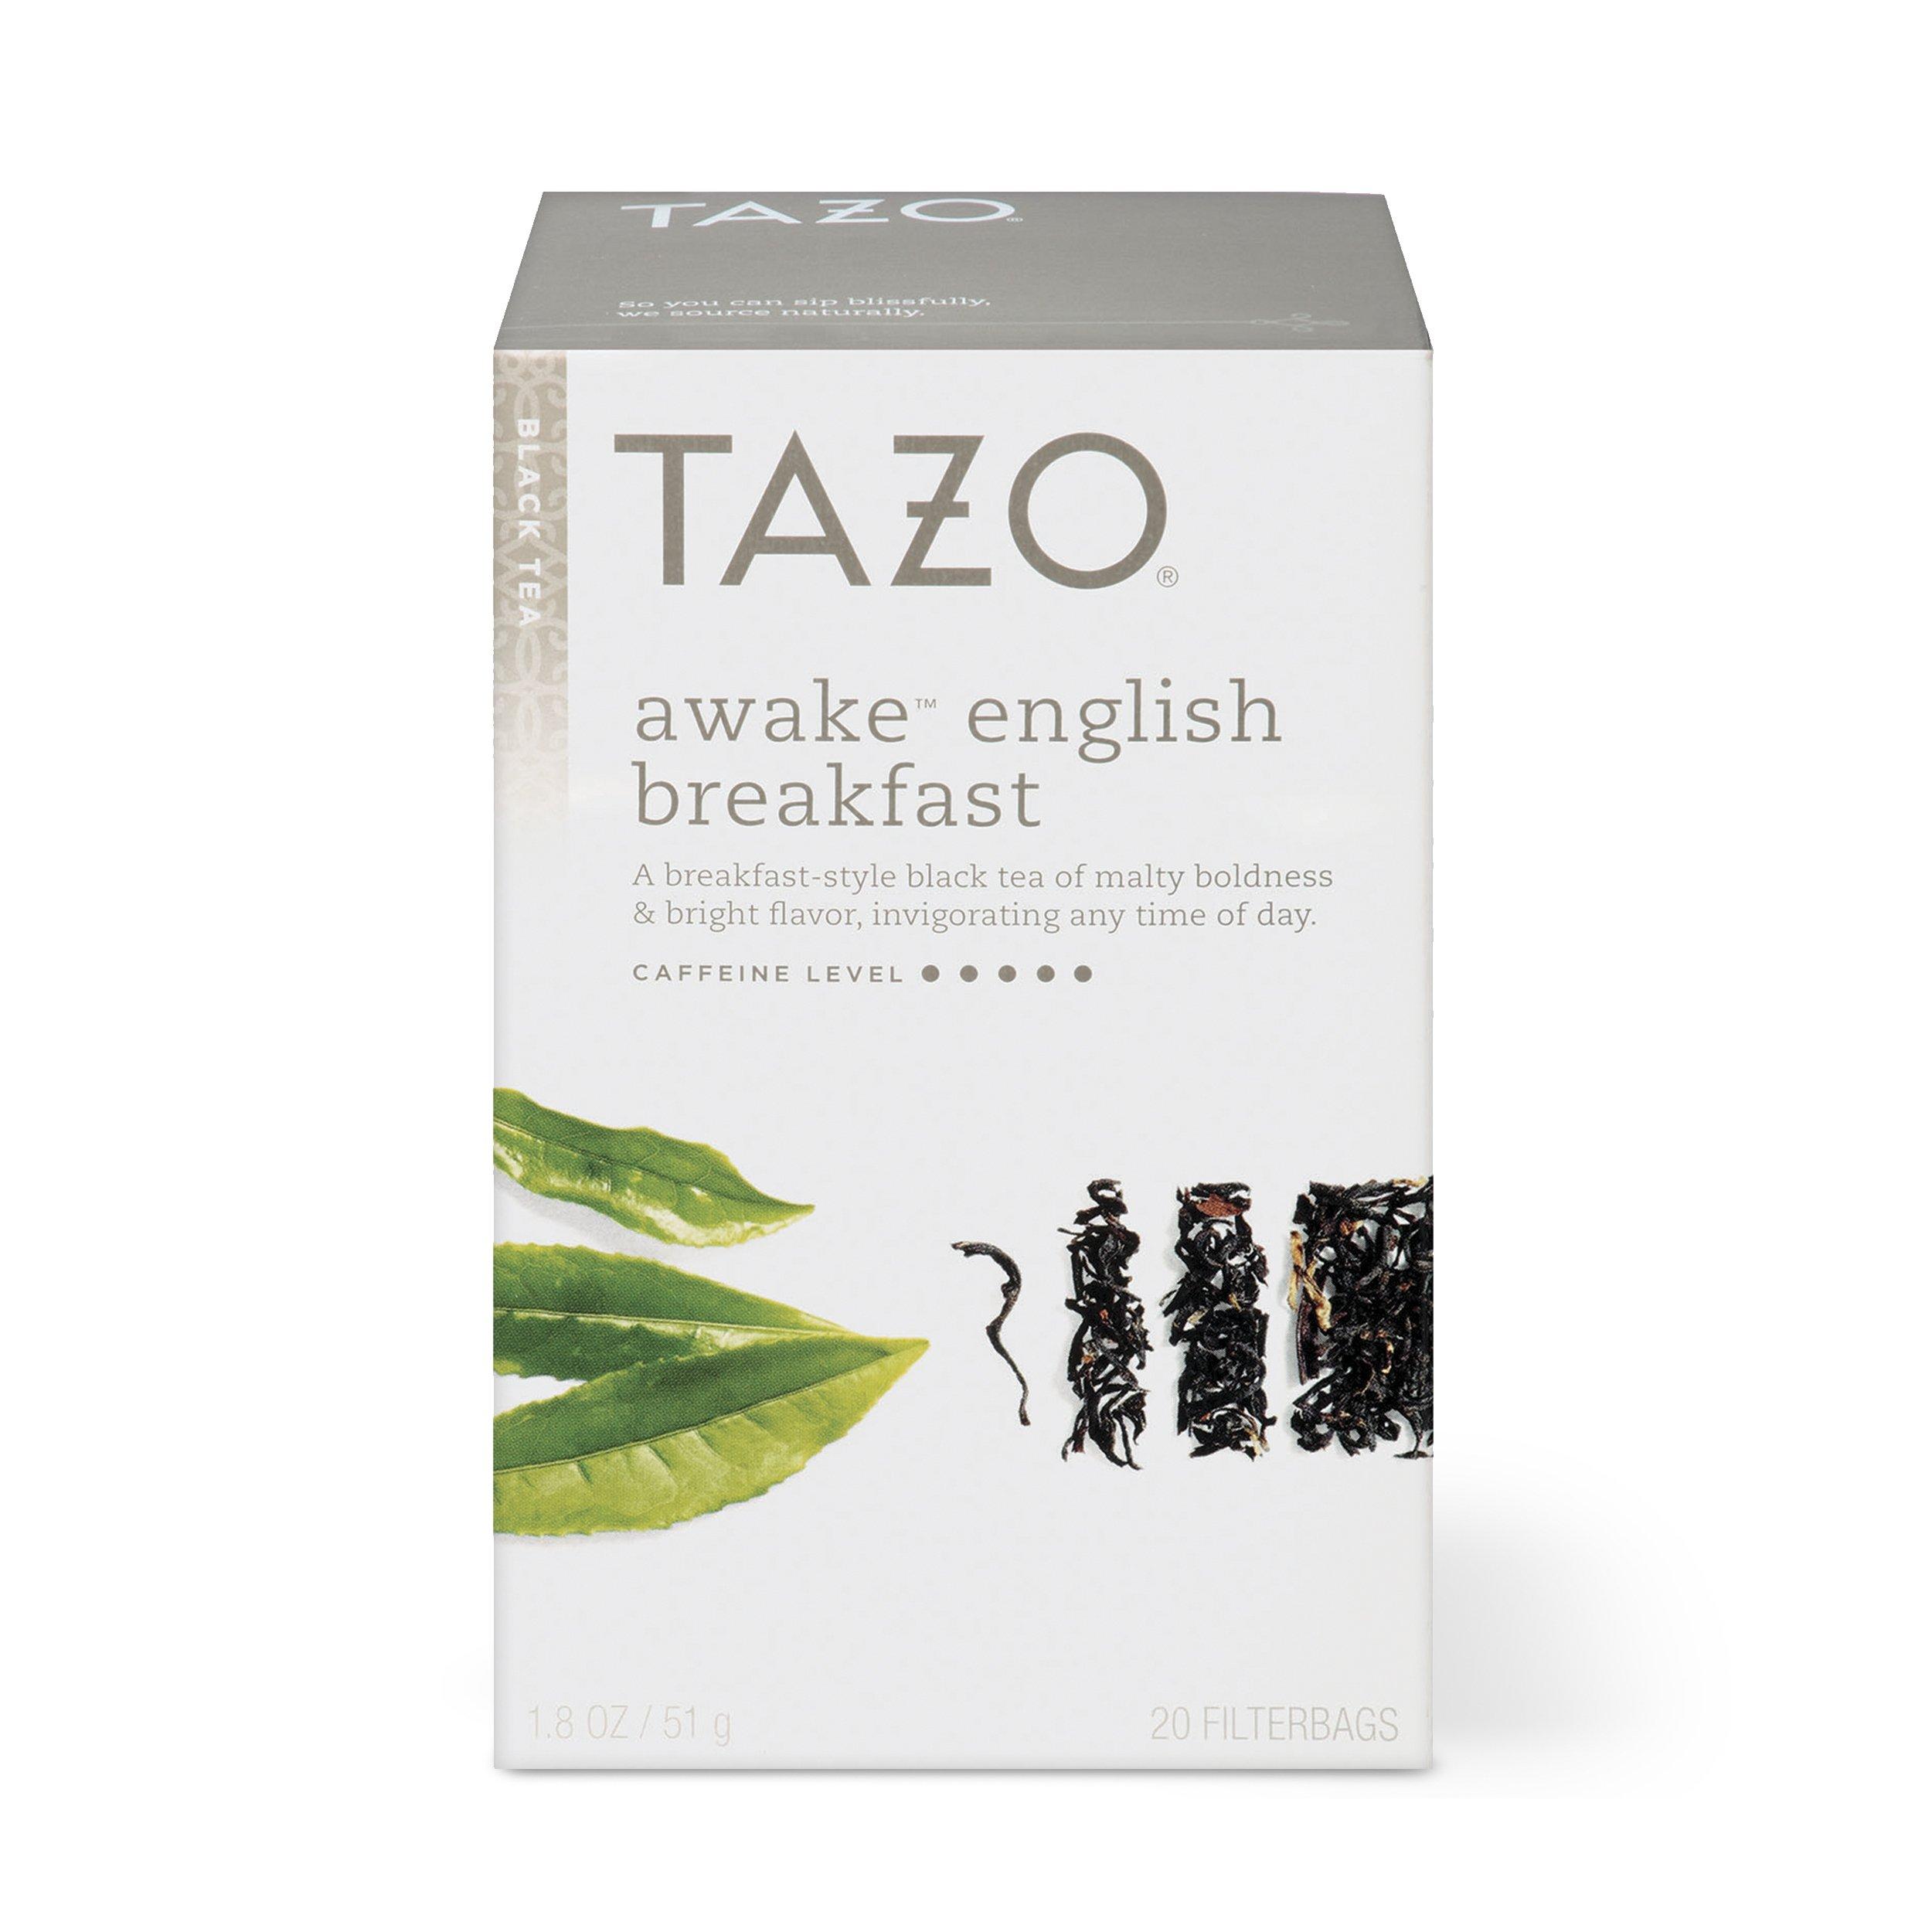 Tazo Awake English Breakfast Black Tea Filterbags (120 count)